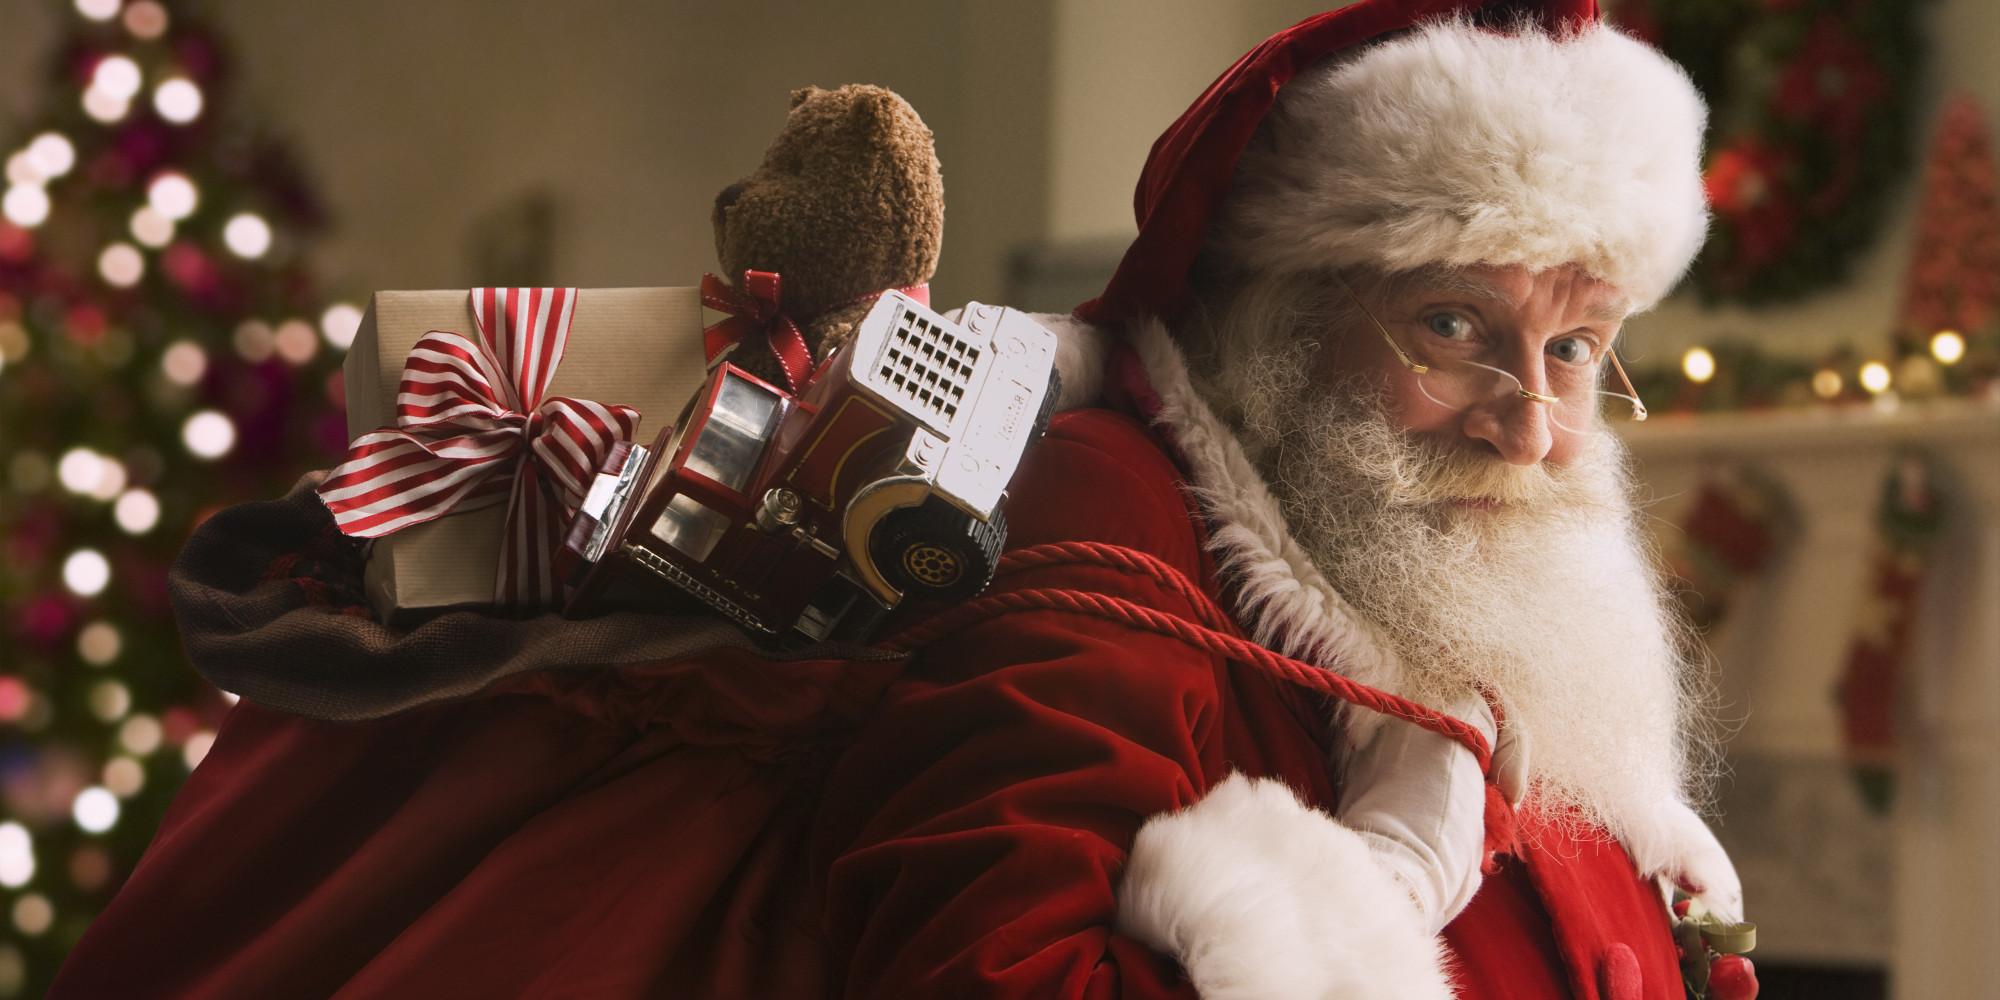 lighten bag - Santa Santa Claus